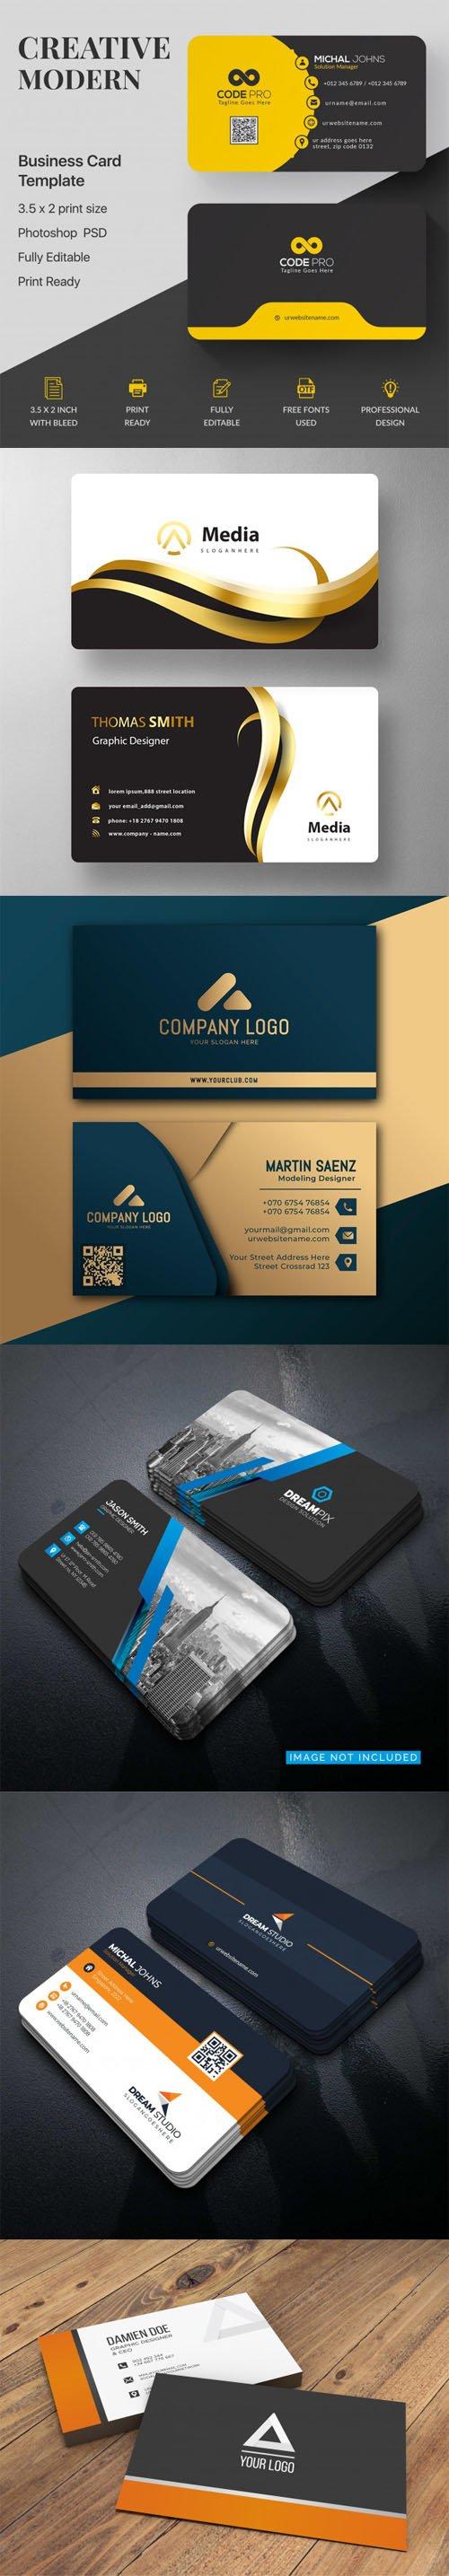 6 Professional Business Card Mockups Templates [PSD/Ai/EPS]